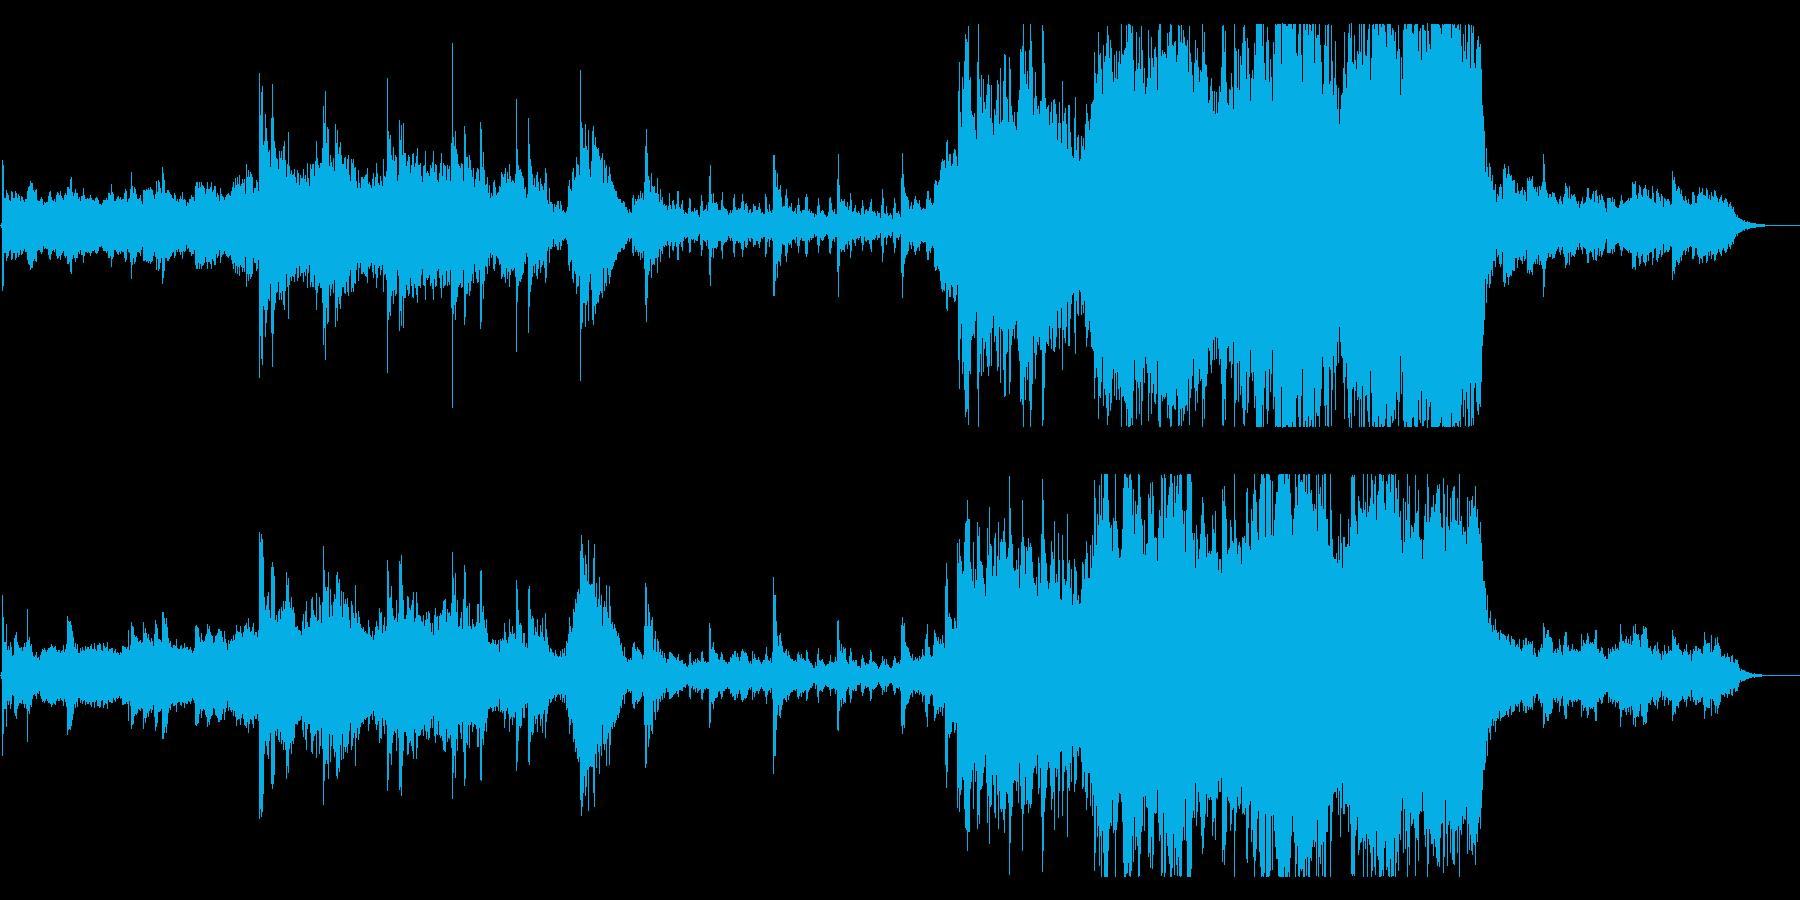 Sky Blueの再生済みの波形